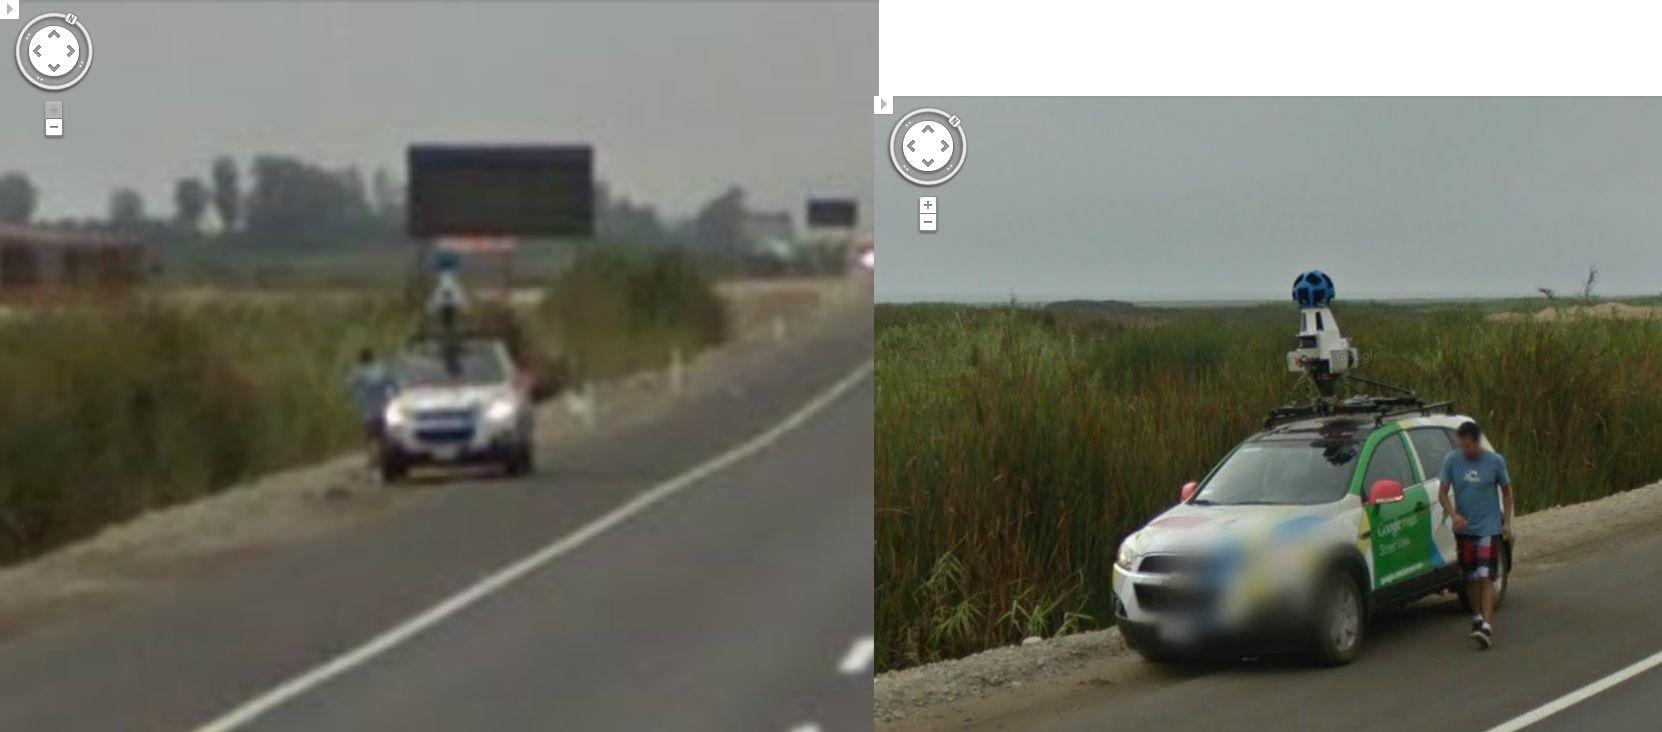 Hilarious Google Street View Captures the Google Street